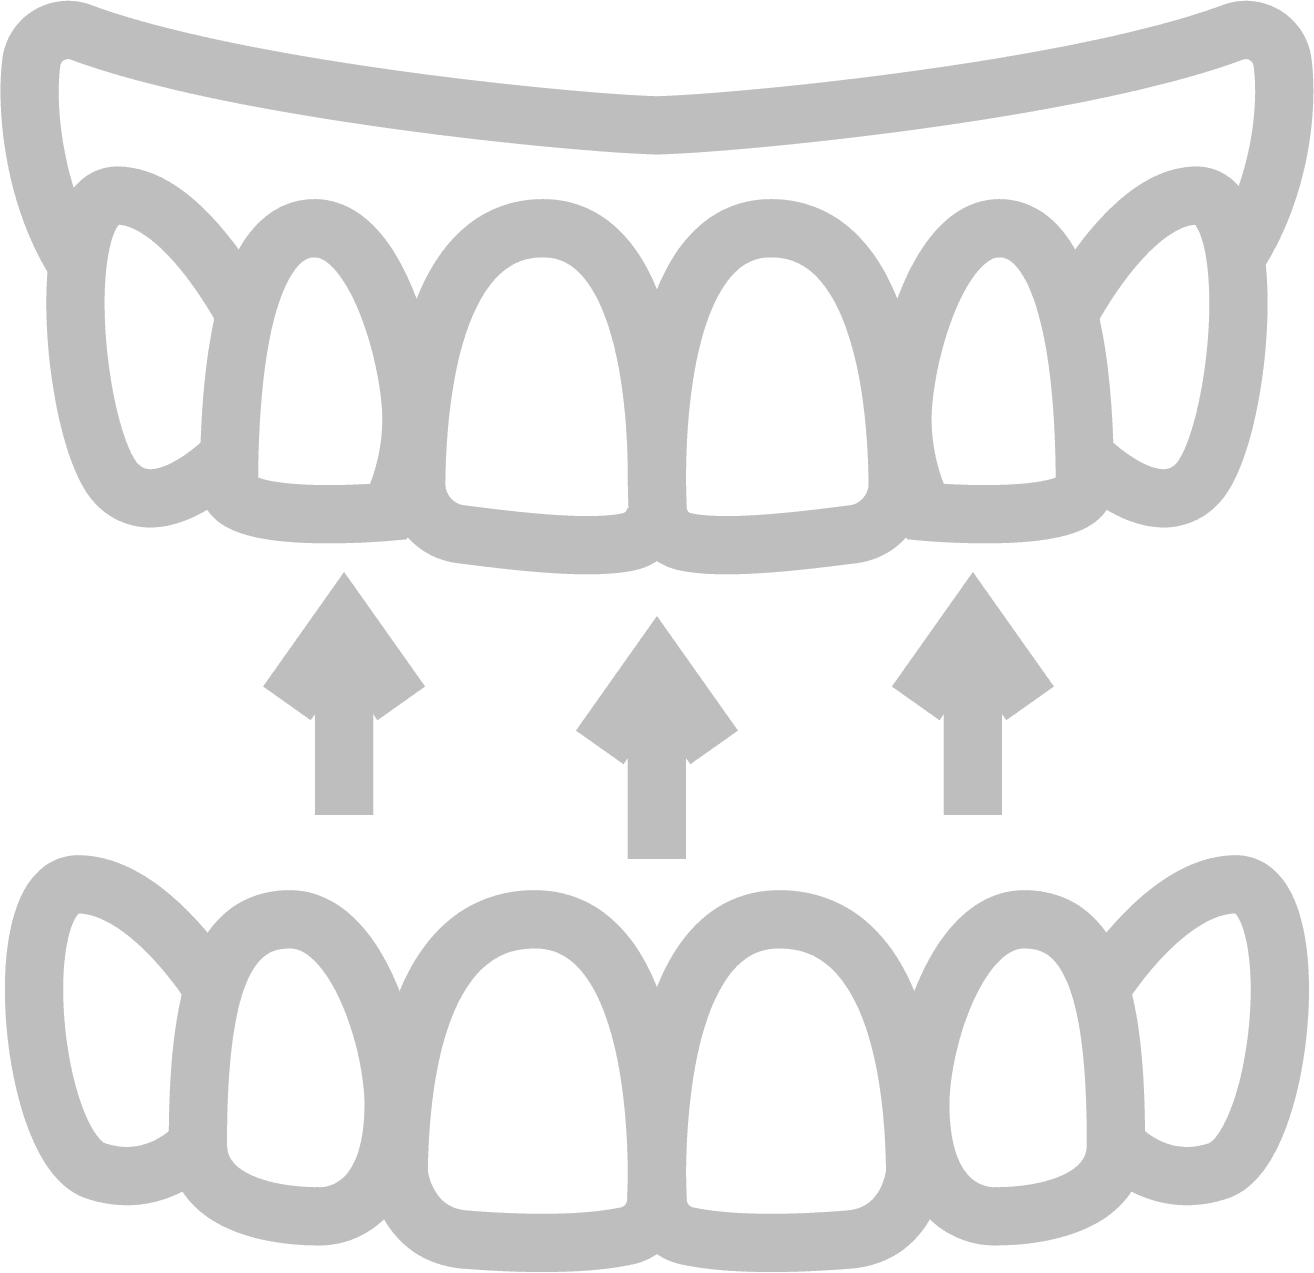 Icona dente curato